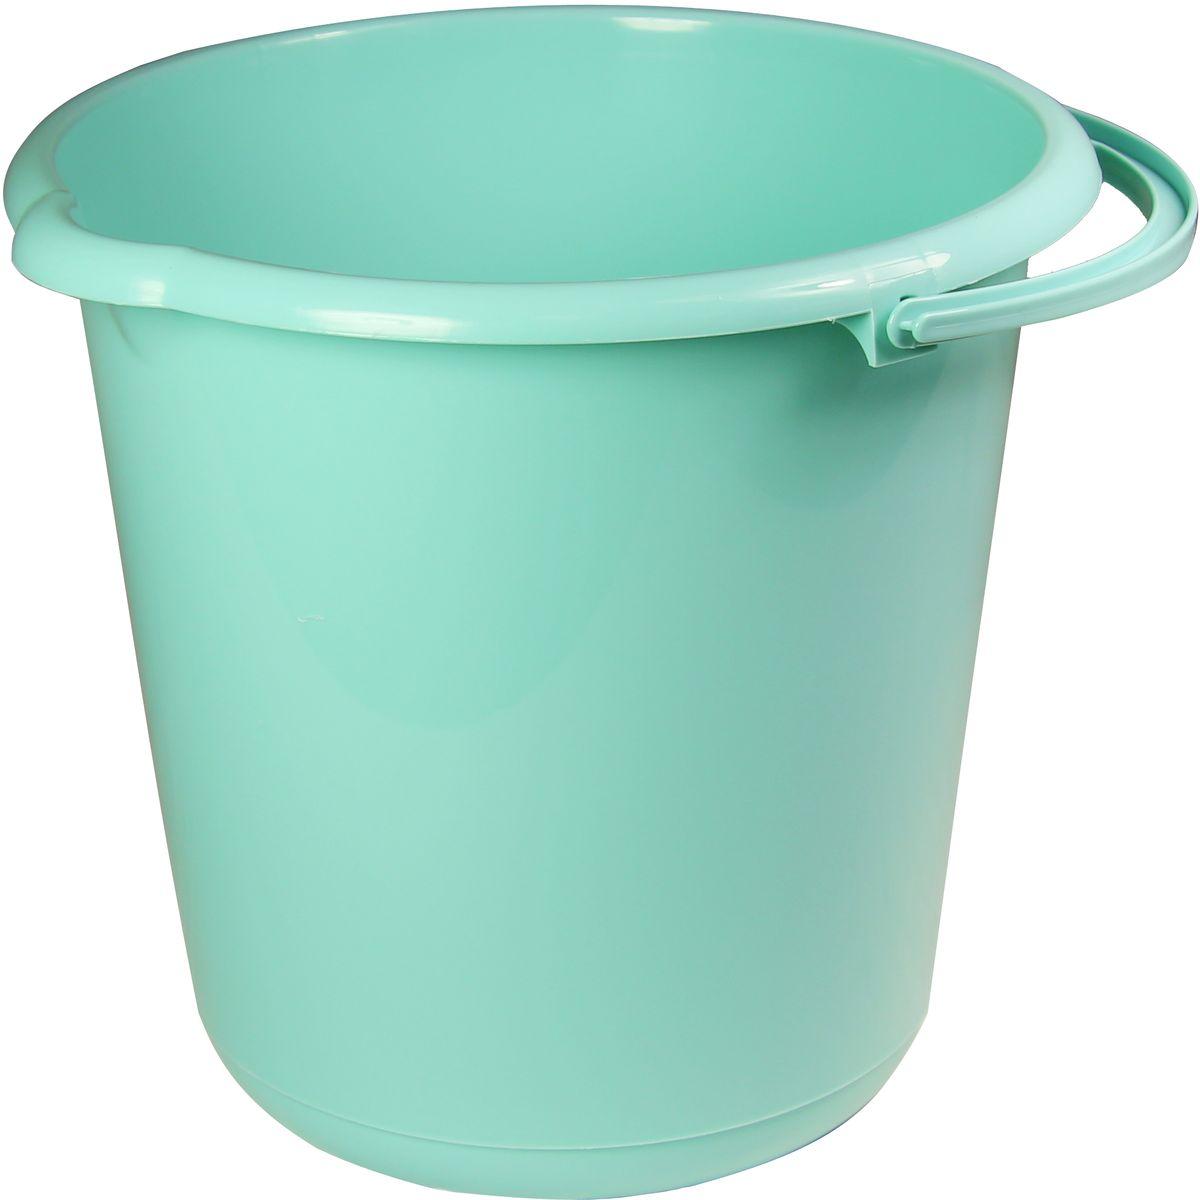 Ведро Idea, цвет: аквамарин, 10 л ведро idea цвет марморный 10 л